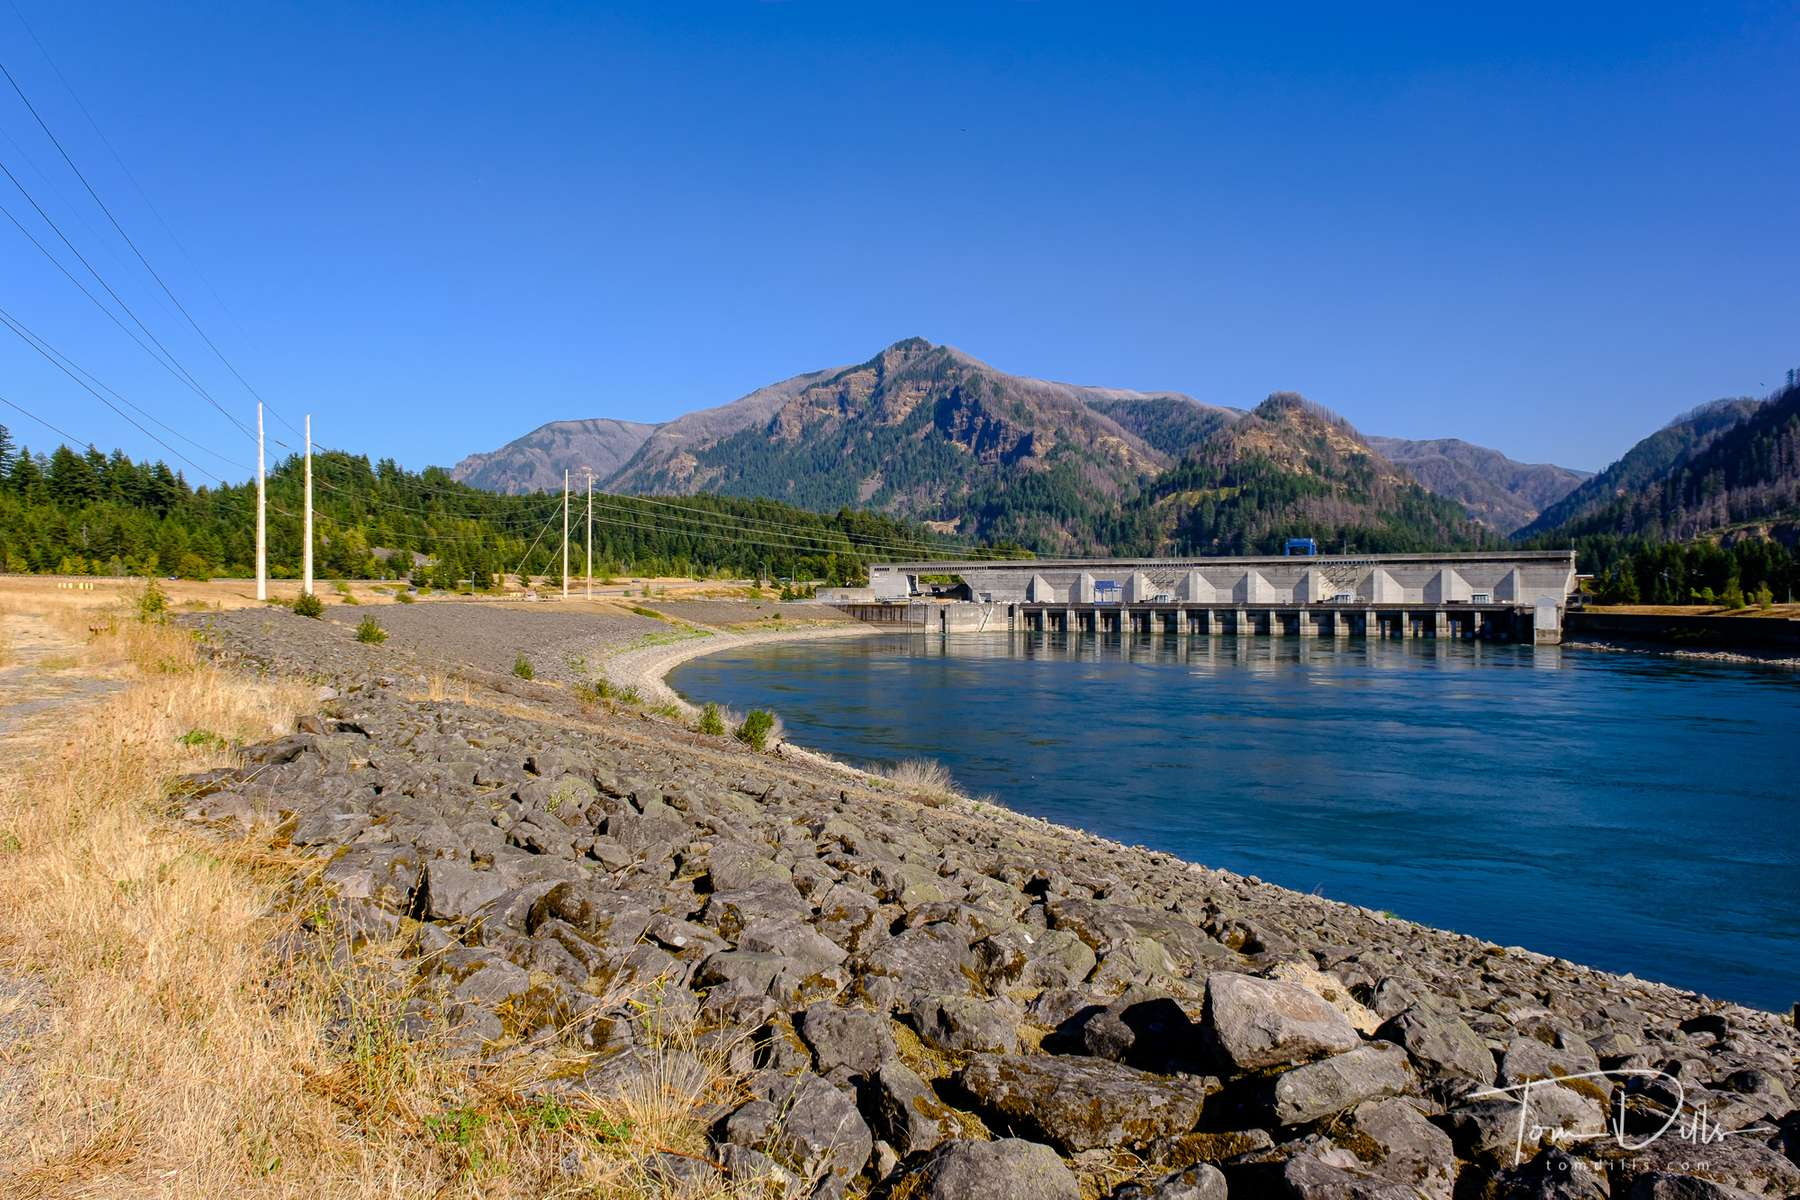 Bonneville Dam and Lock on the Columbia River near Bonneville, Washington